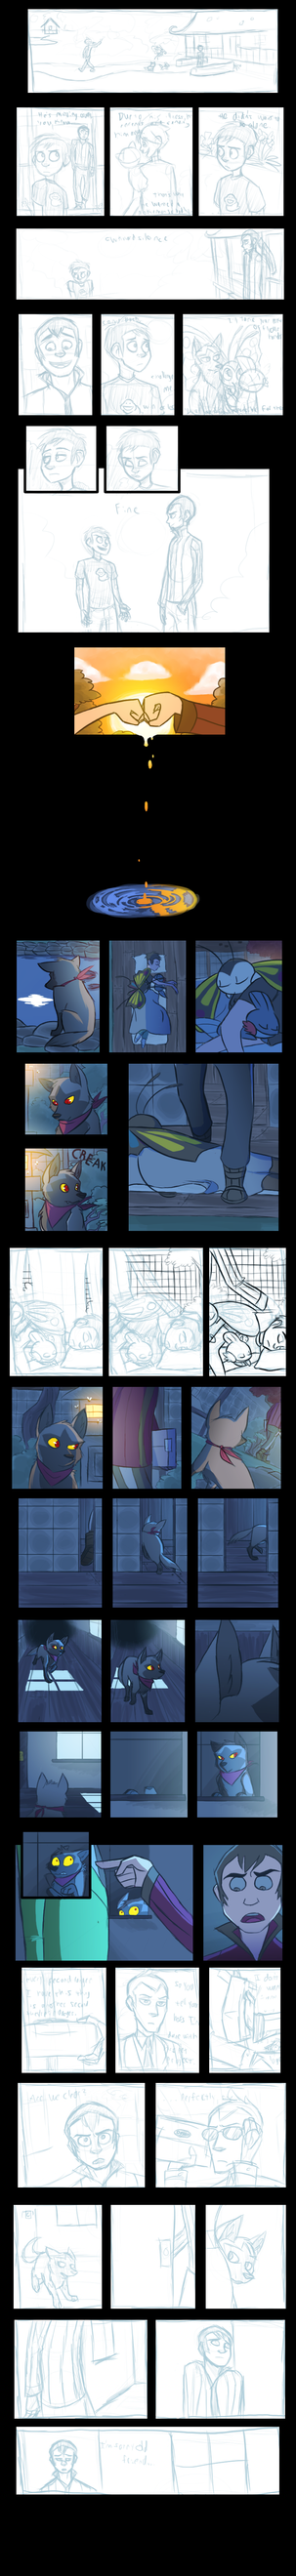 Emerald Nuzlocke Page 5C Incomplete by ruddyowls